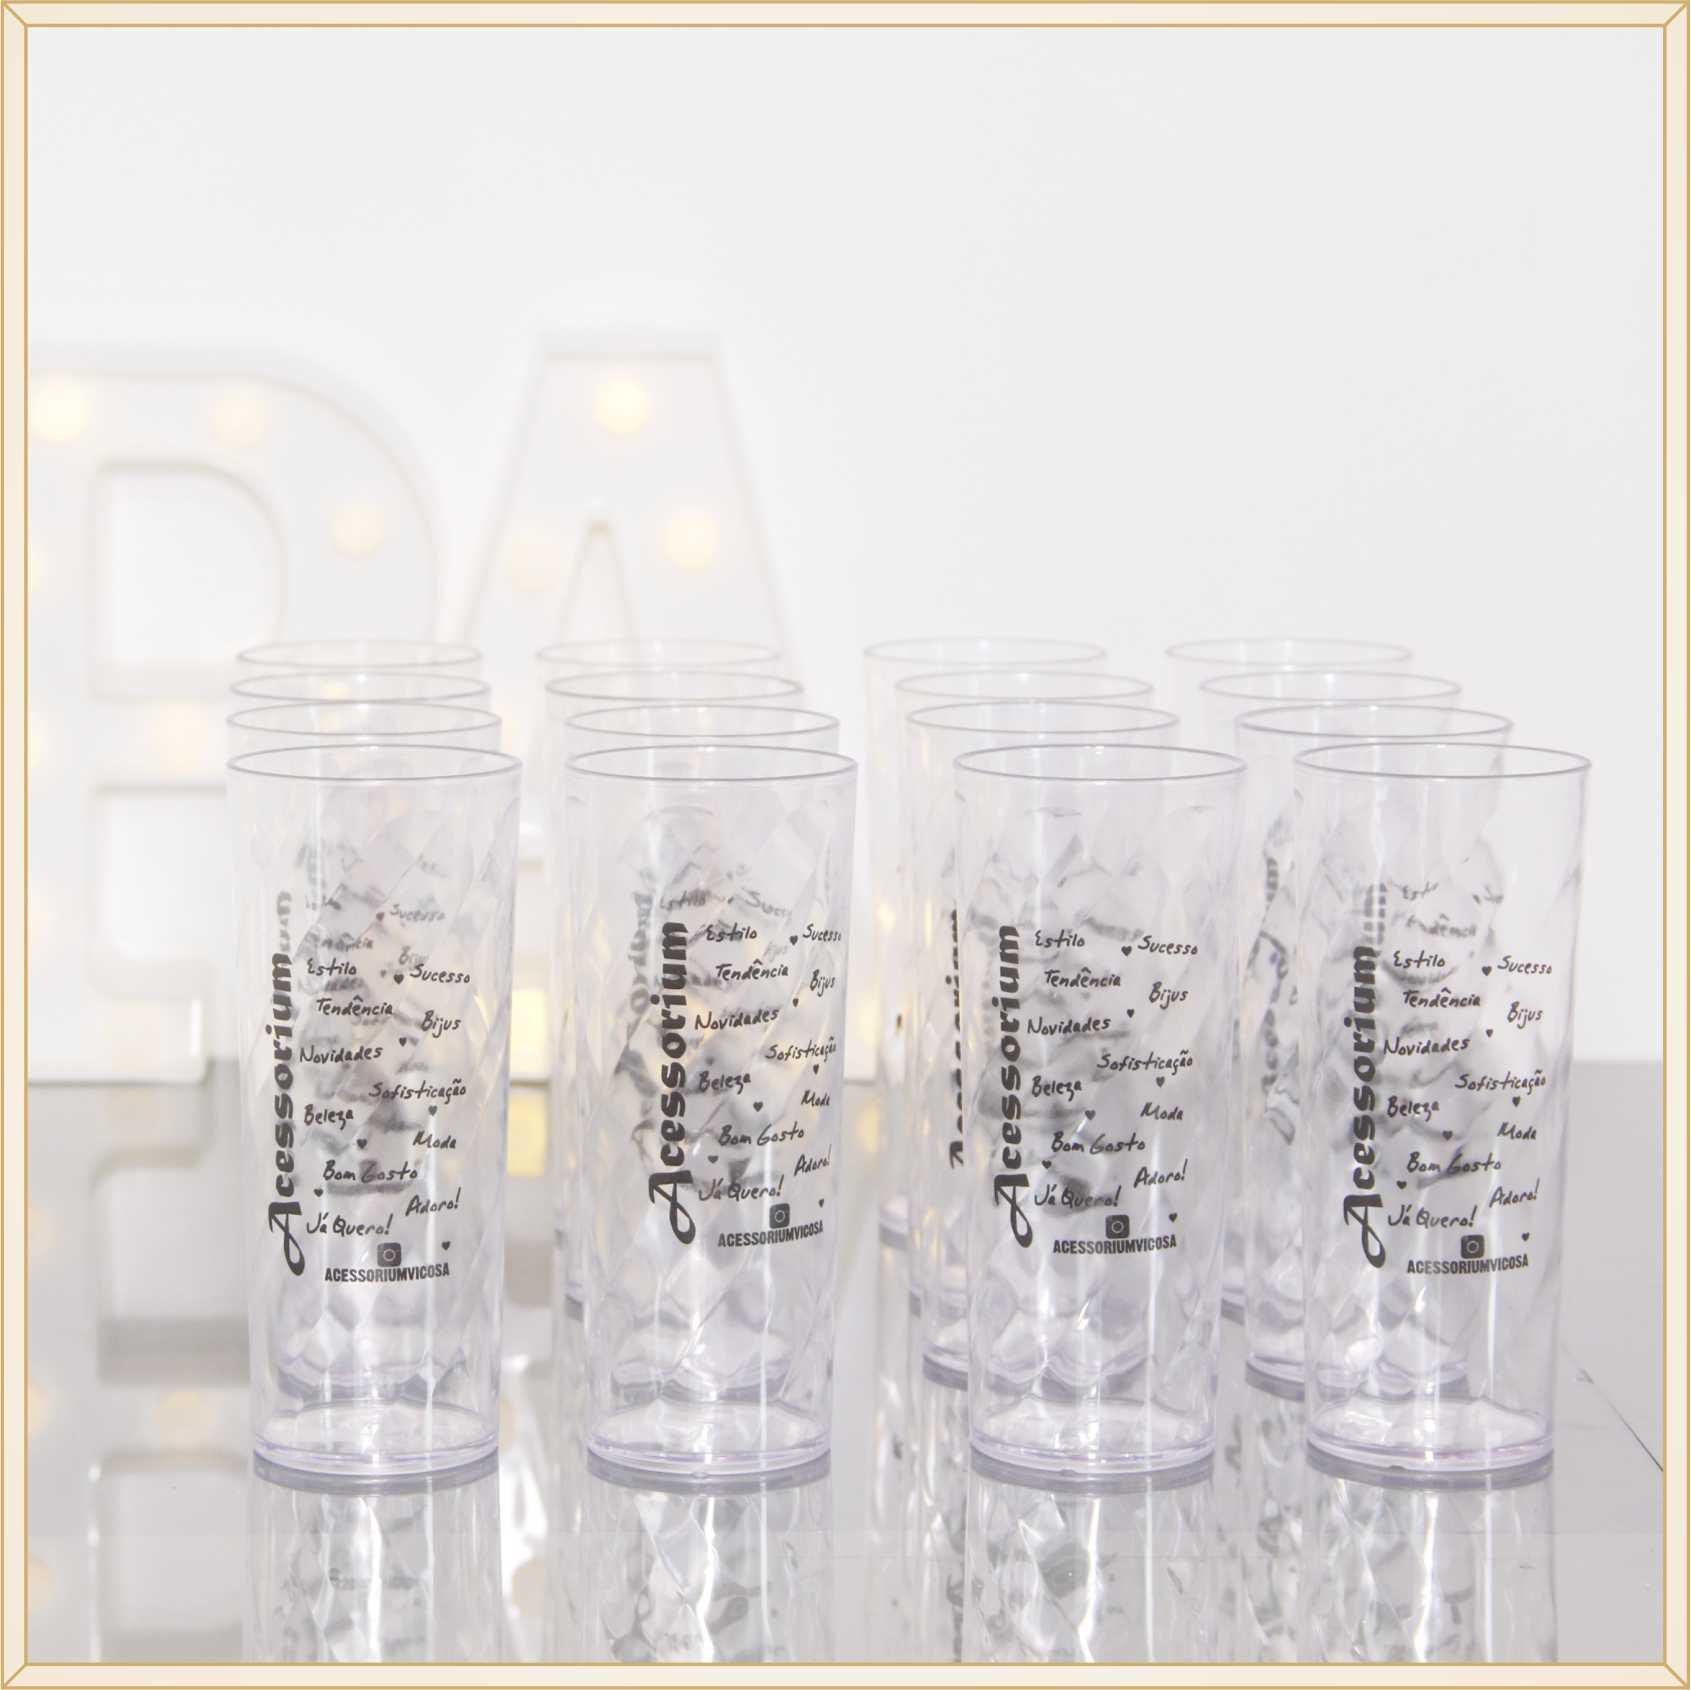 30 Copos long drink de acrílico personalizados brindes empresariais feiras e eventos corporativos